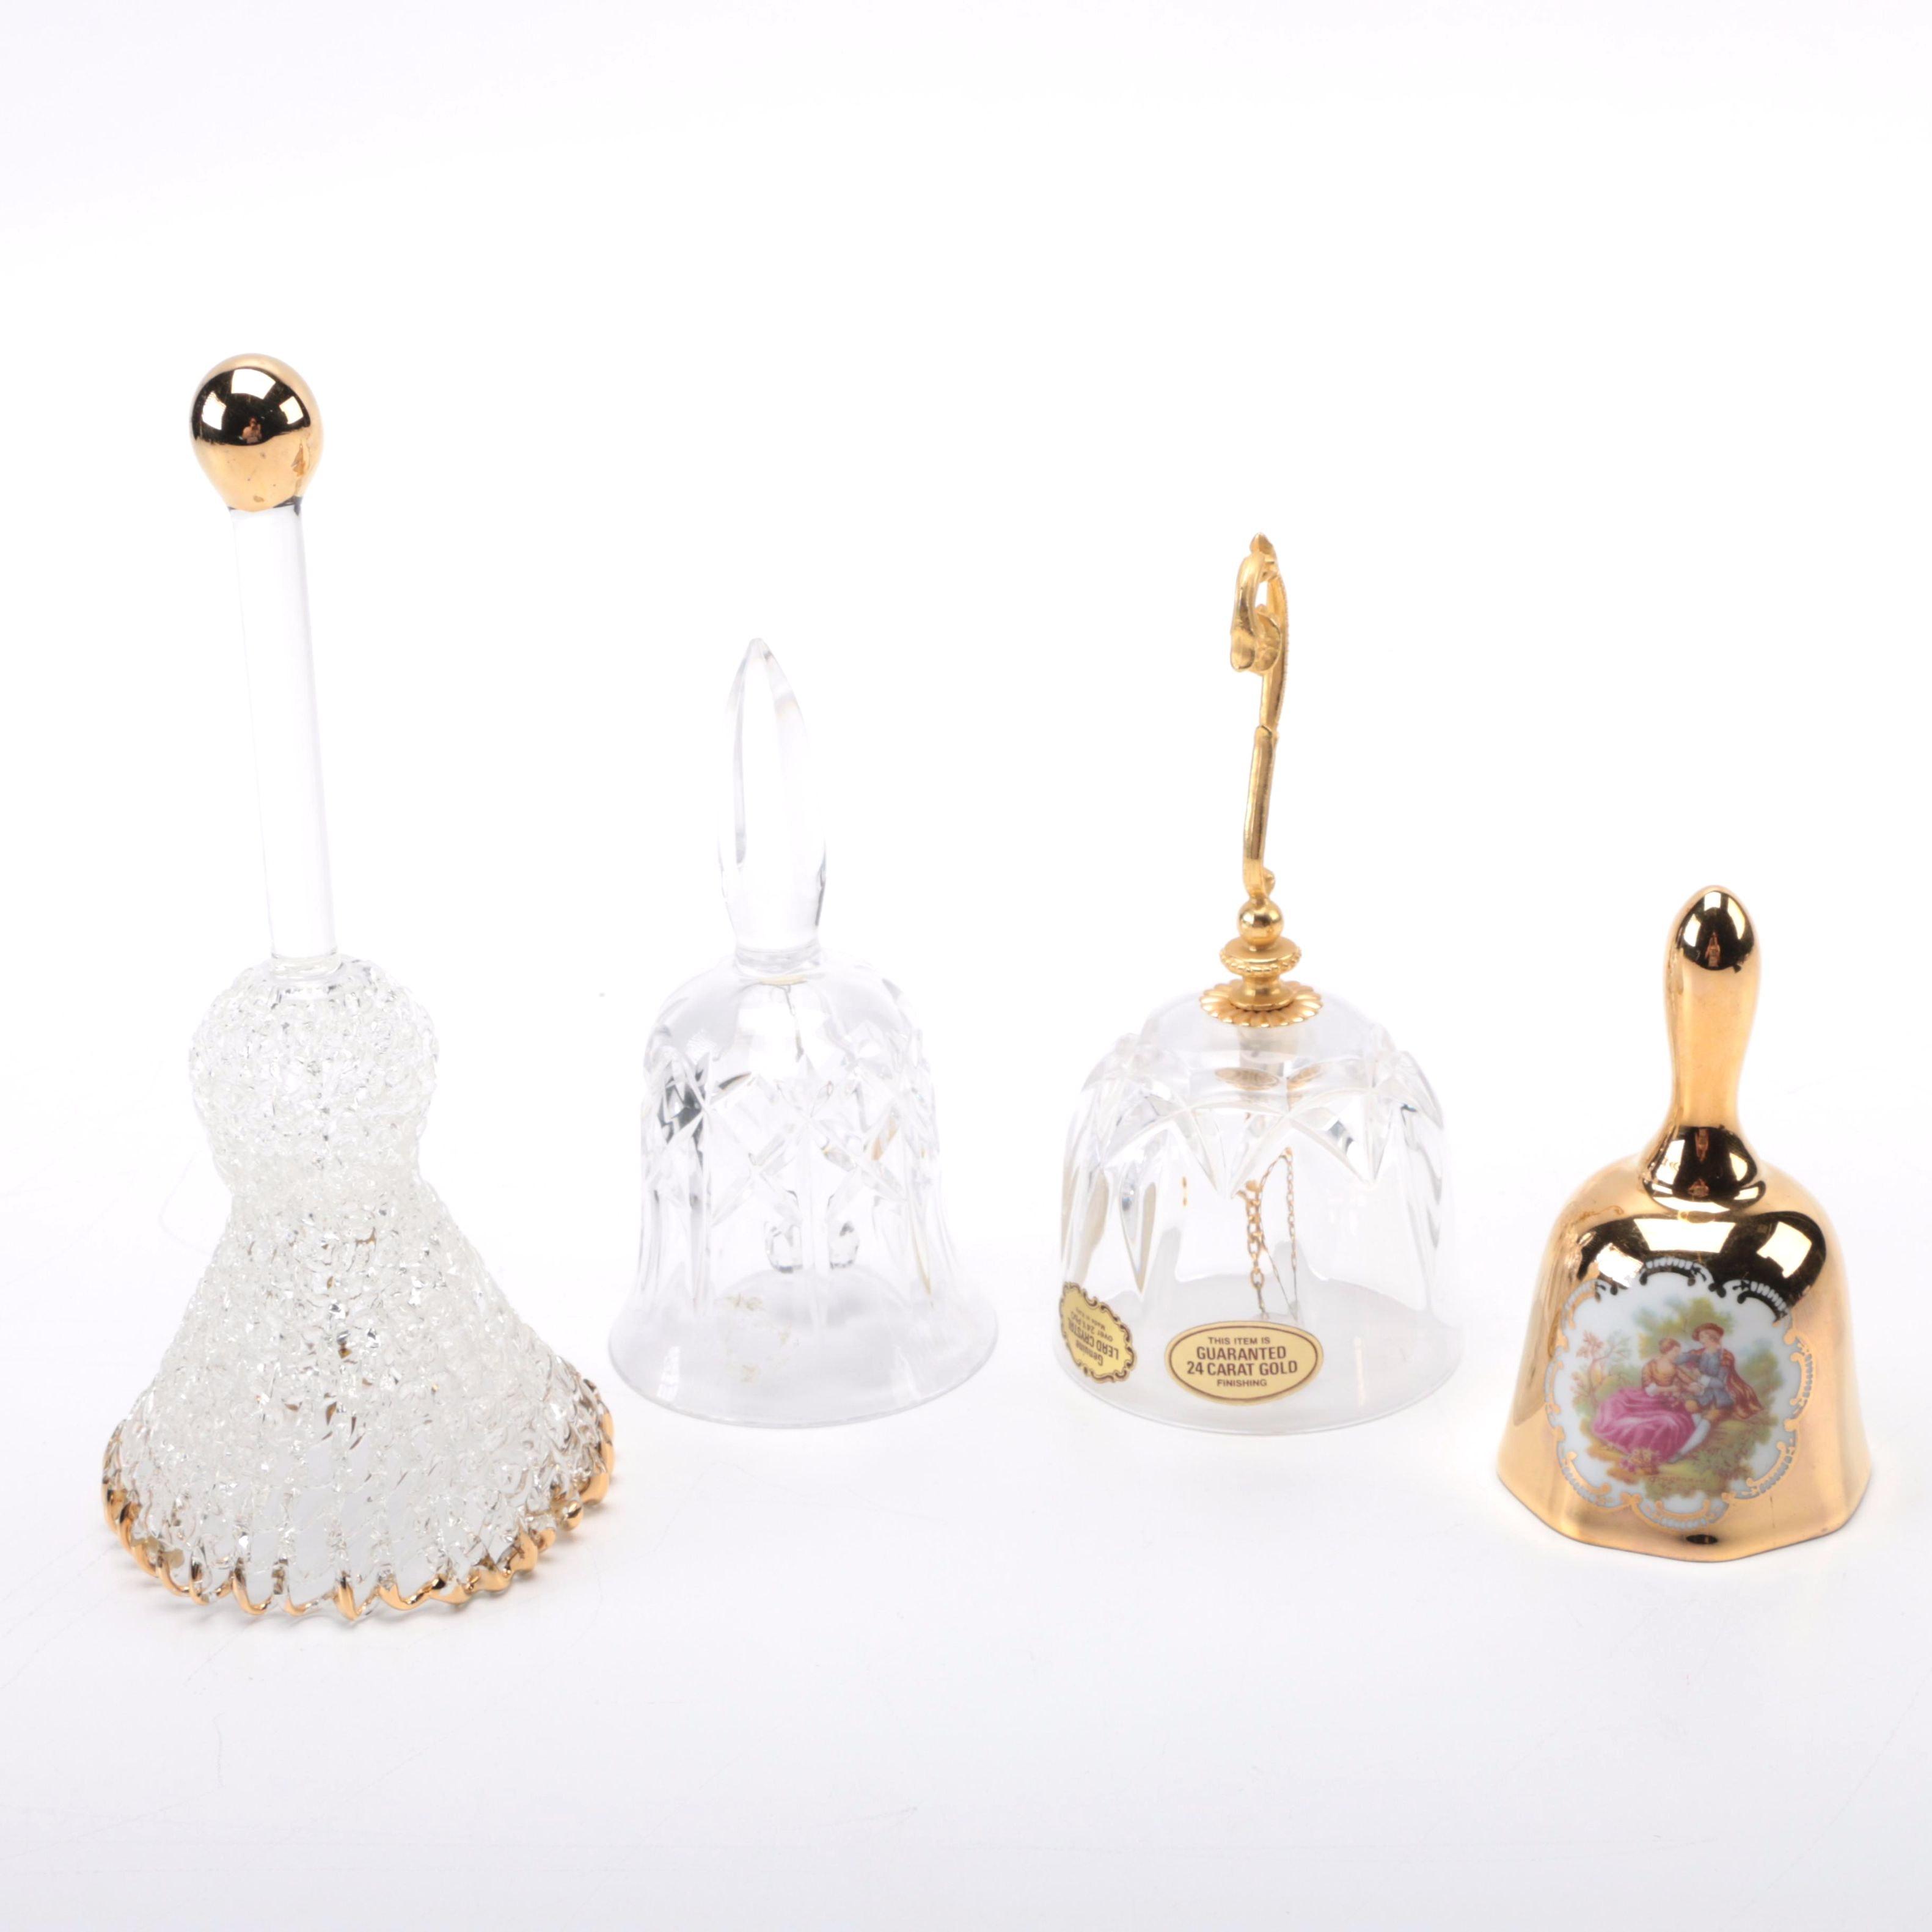 Dinner Bells Featuring Bavarian Kleiber and Italian Crystal